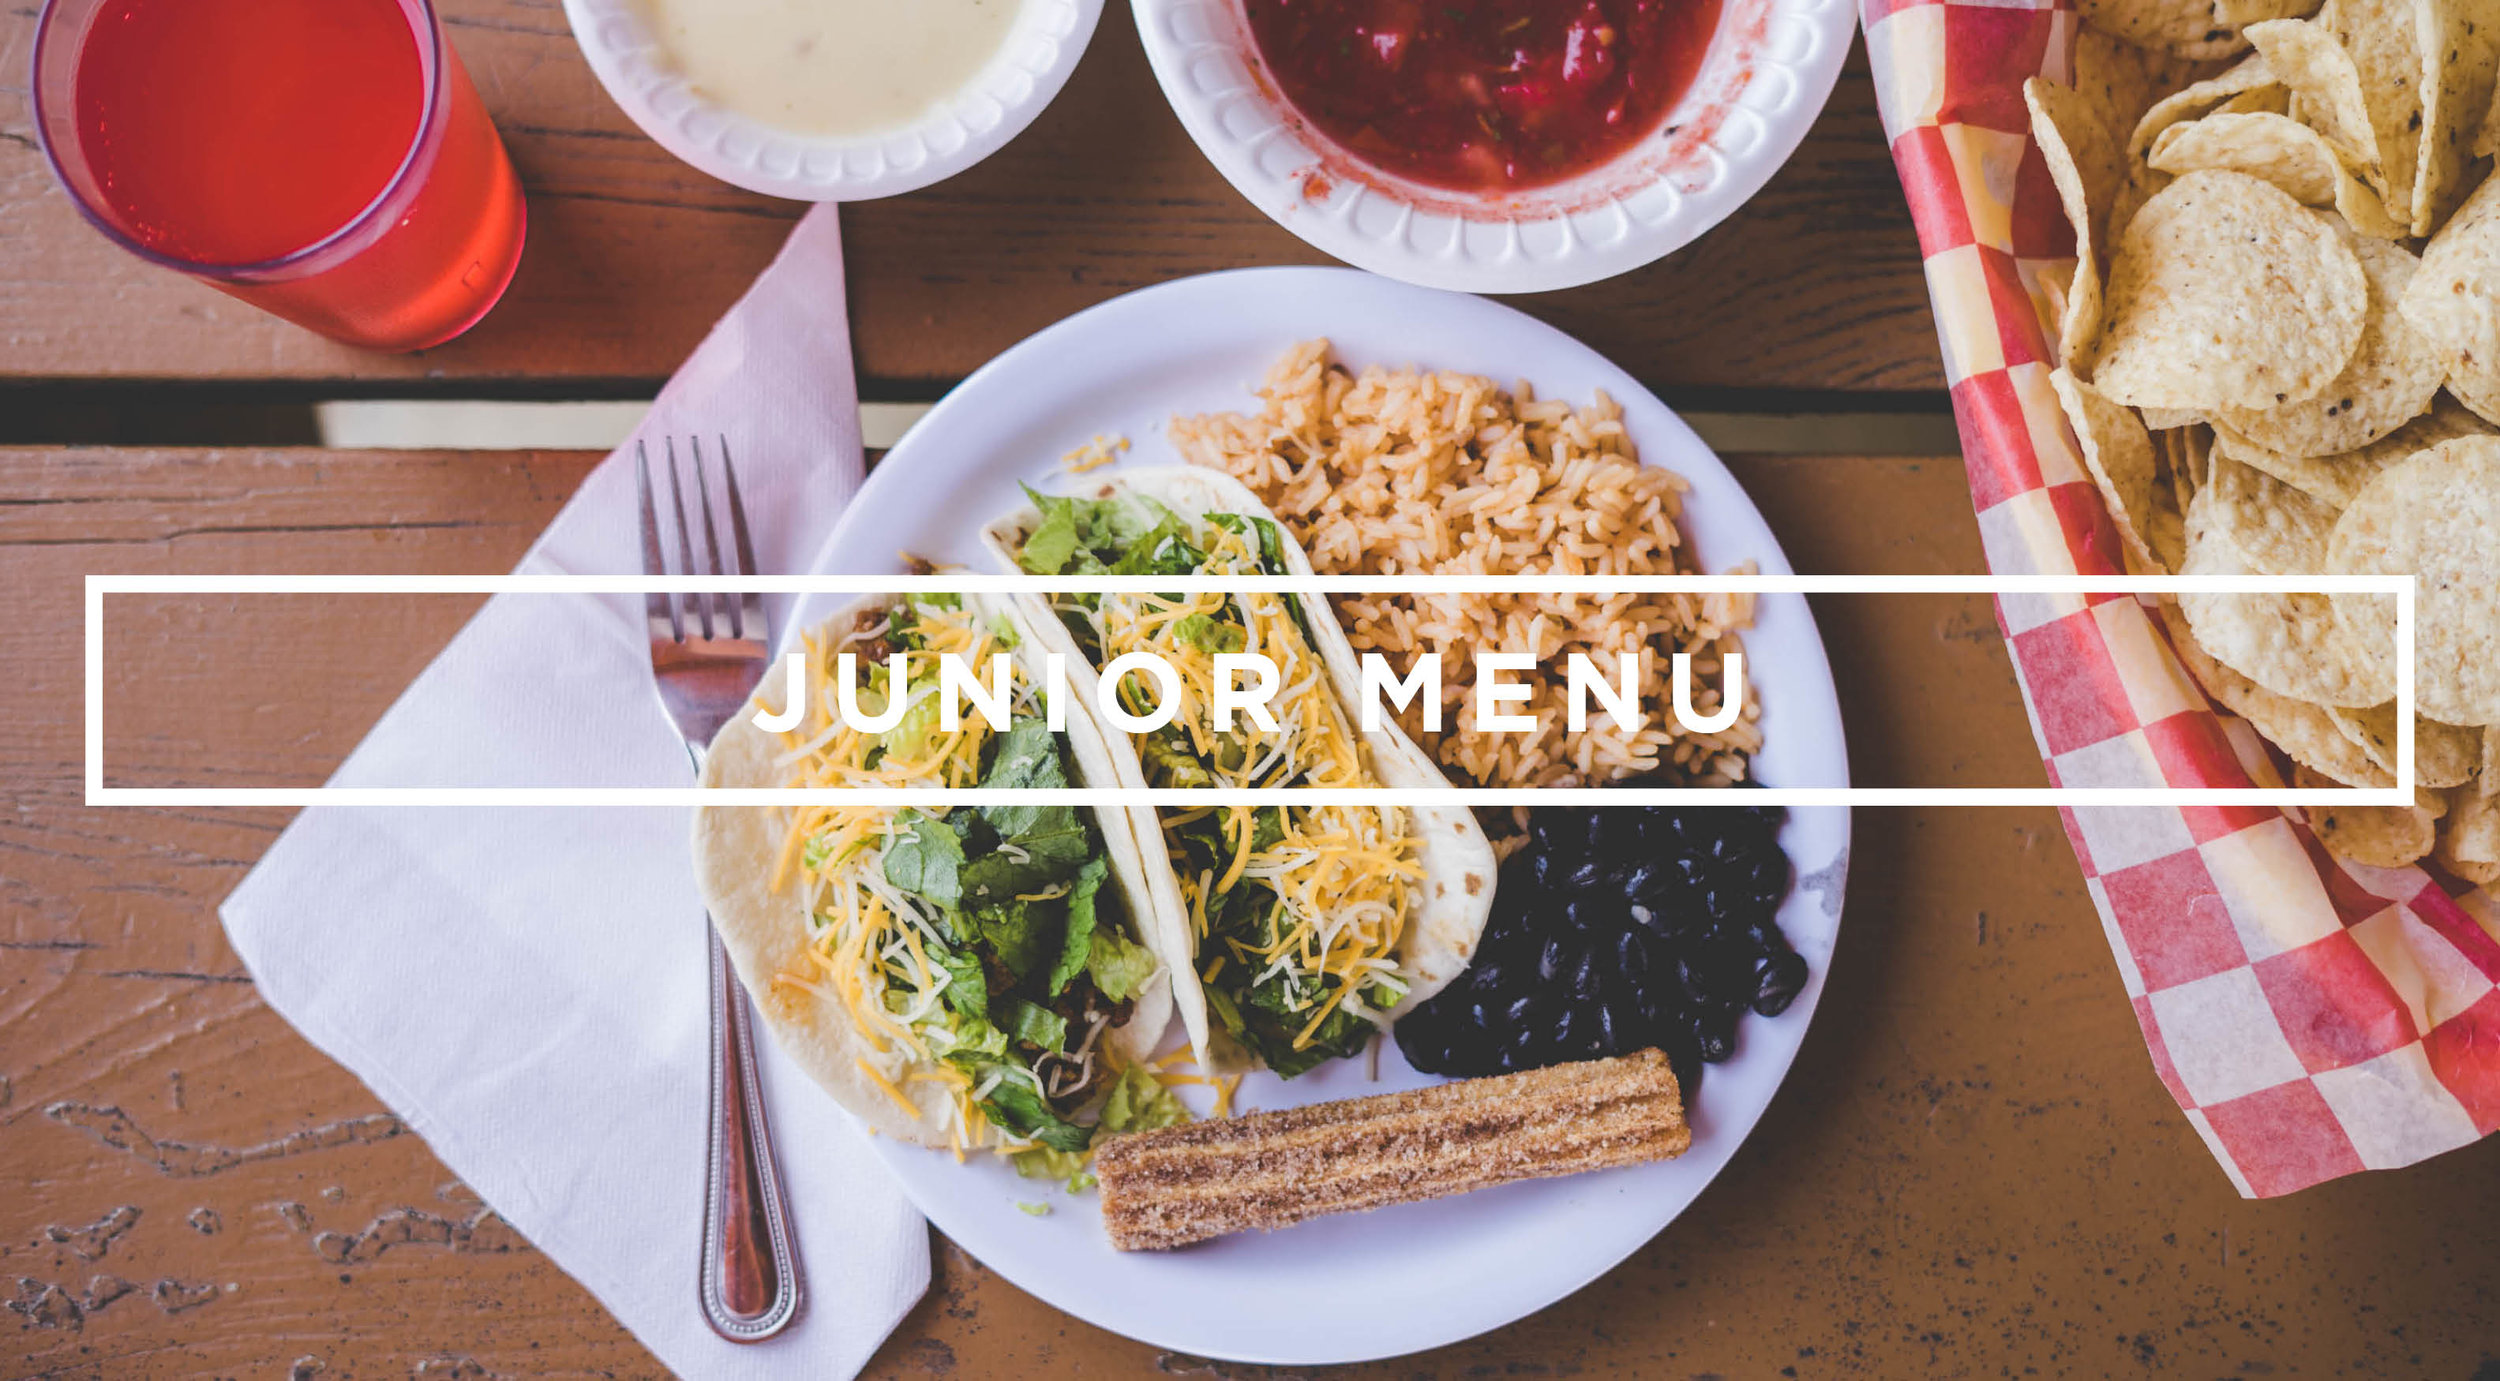 junior menu.jpg